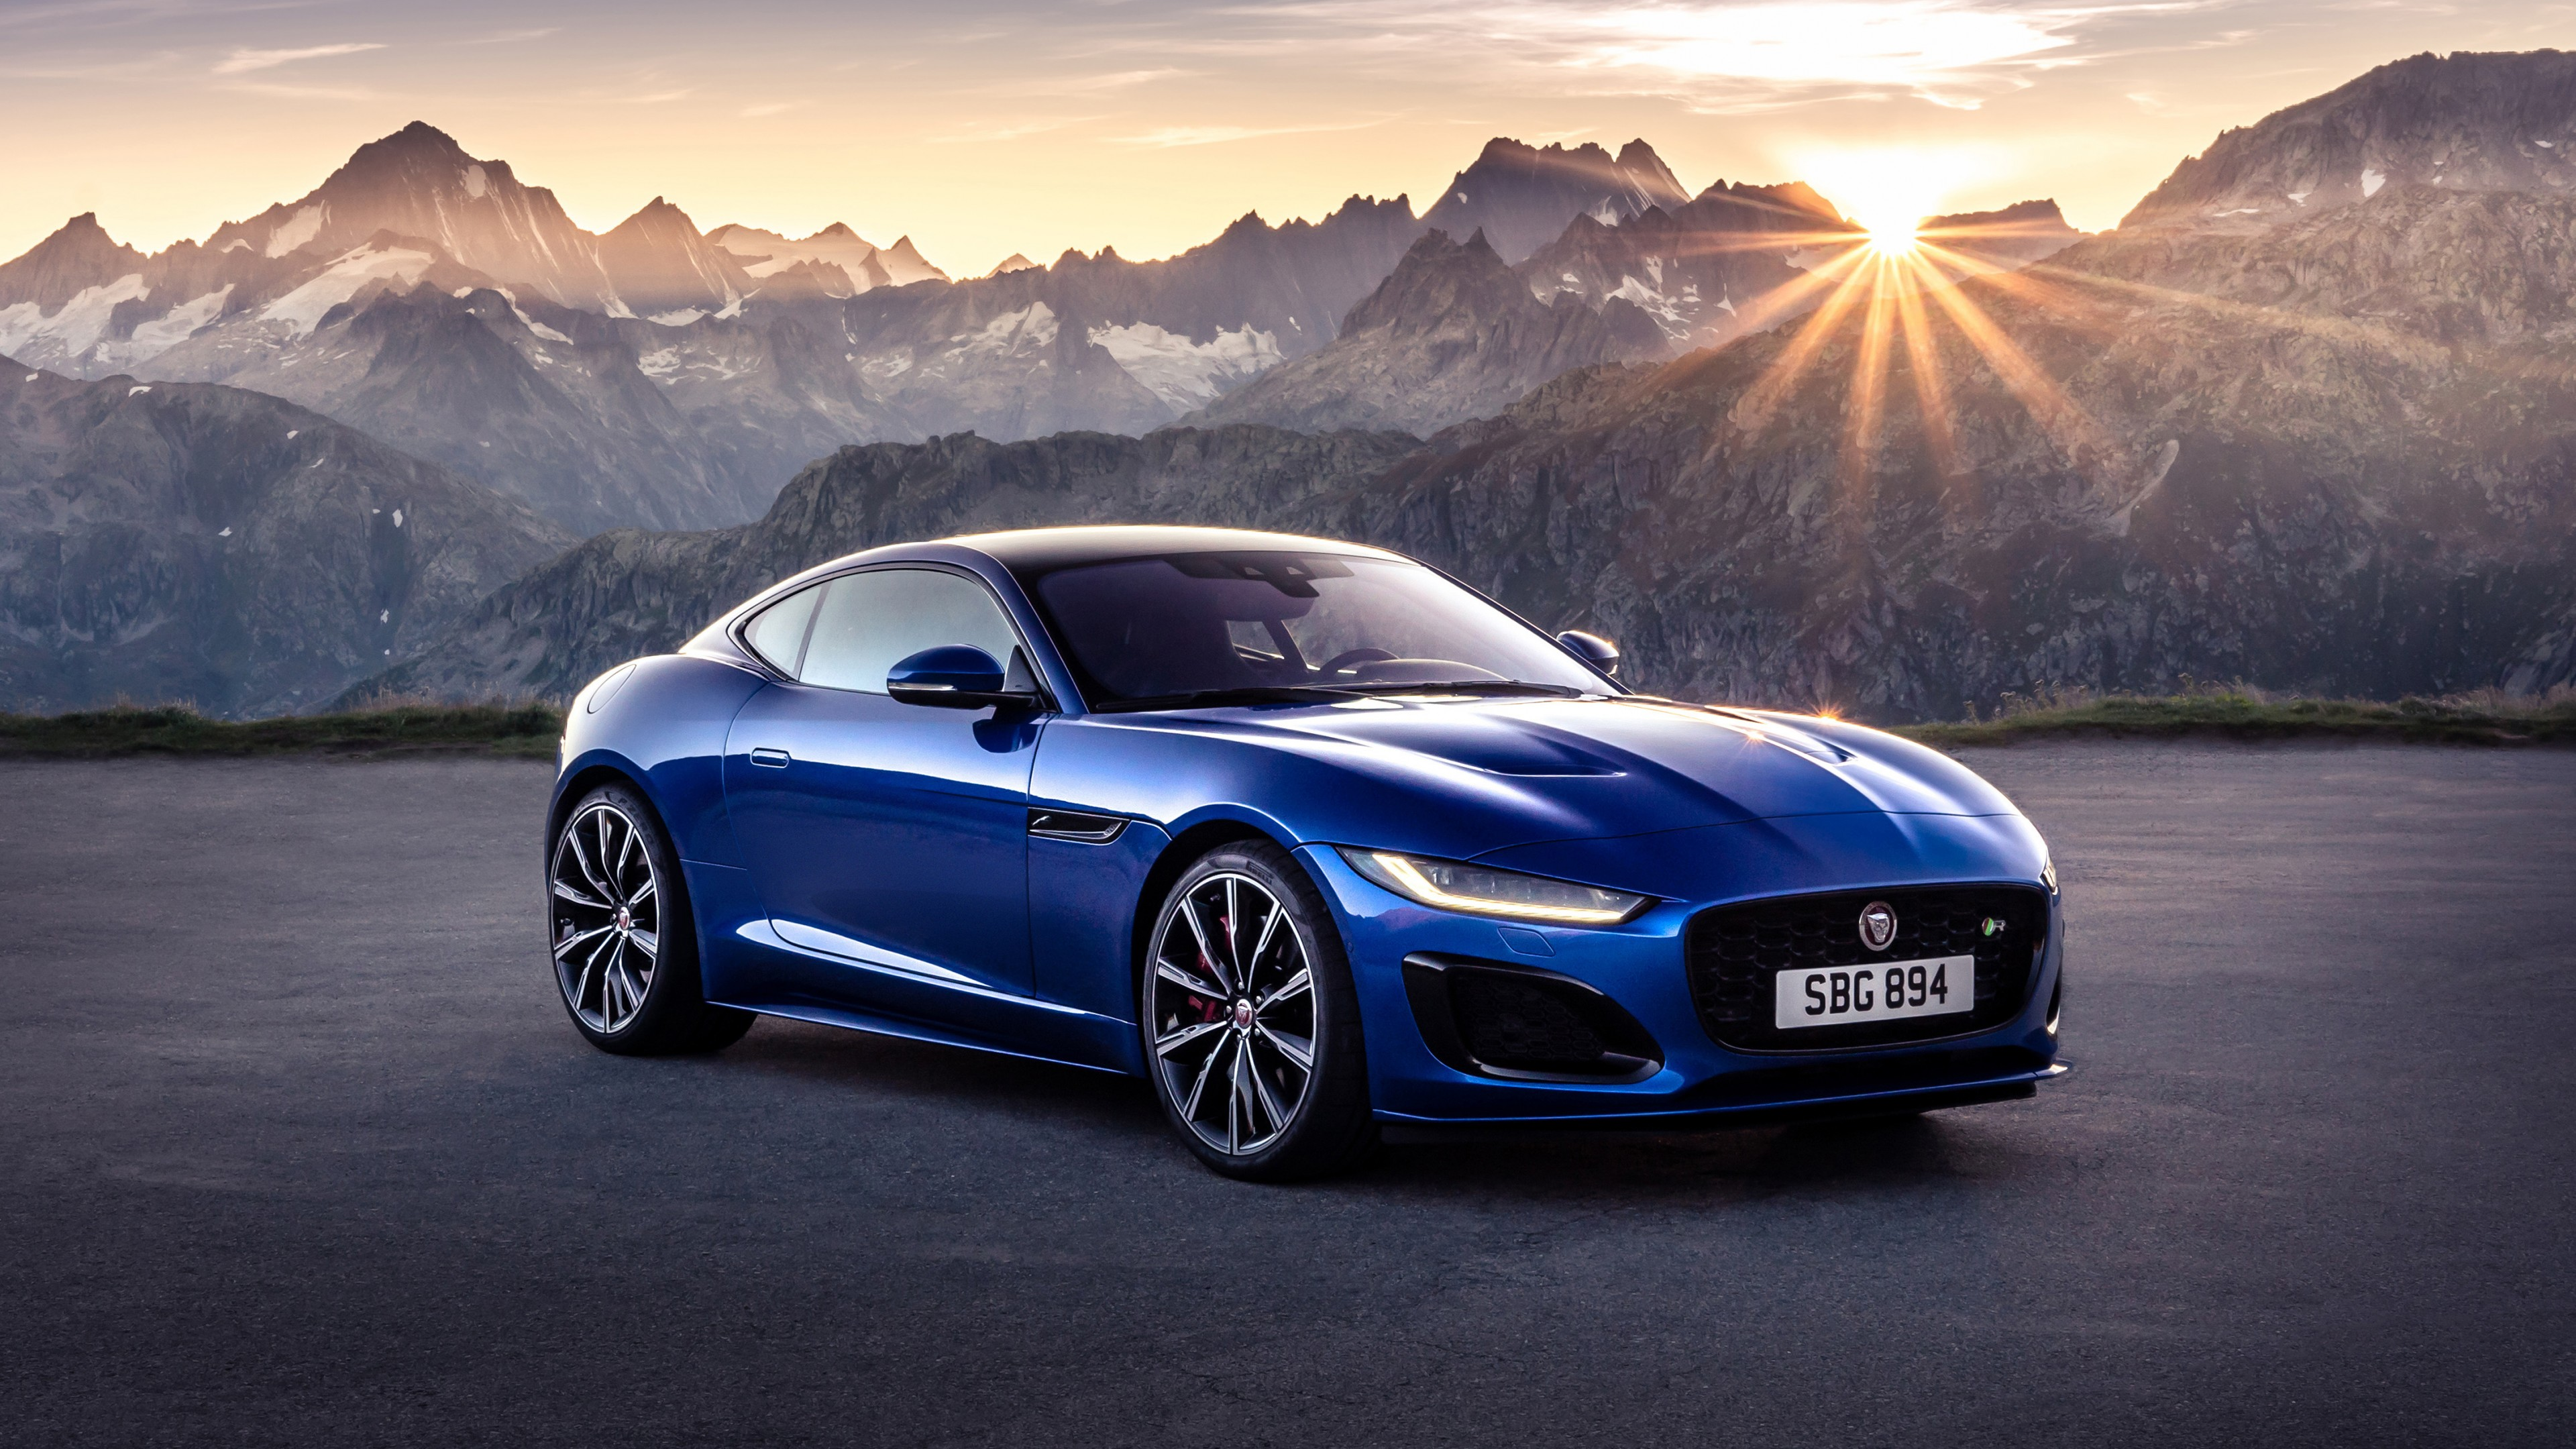 Jaguar F Type R Coupe 2020 4k Wallpaper Hd Car Wallpapers Id 13914